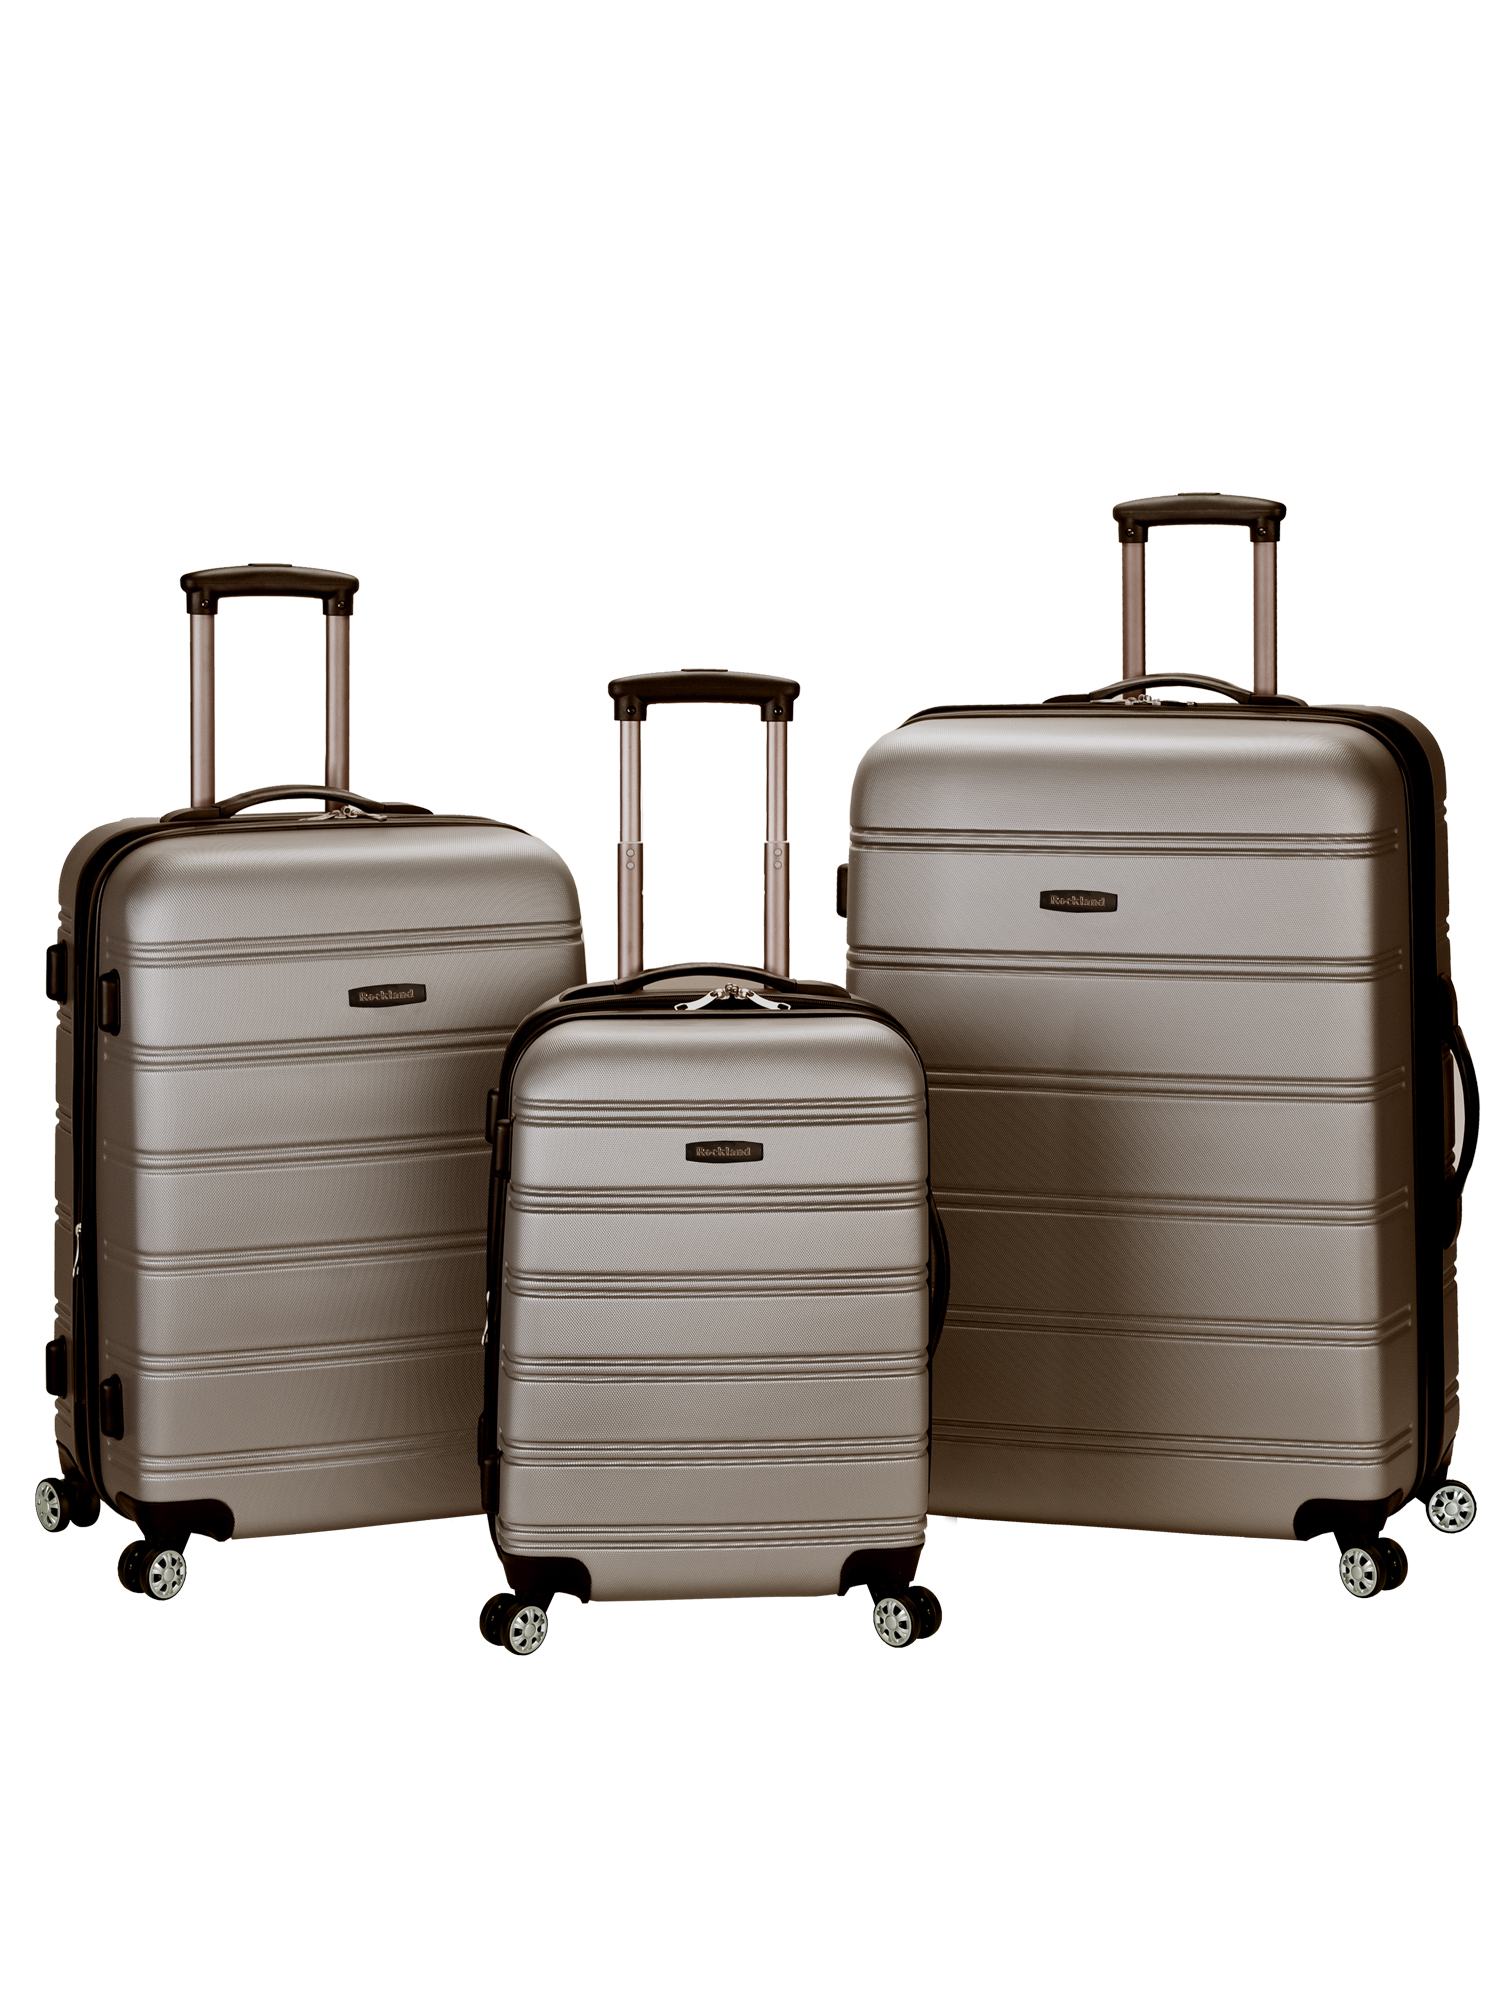 b816c0c99 Rockland Luggage Melbourne 3 Piece Hardside Luggage Set - Walmart.com